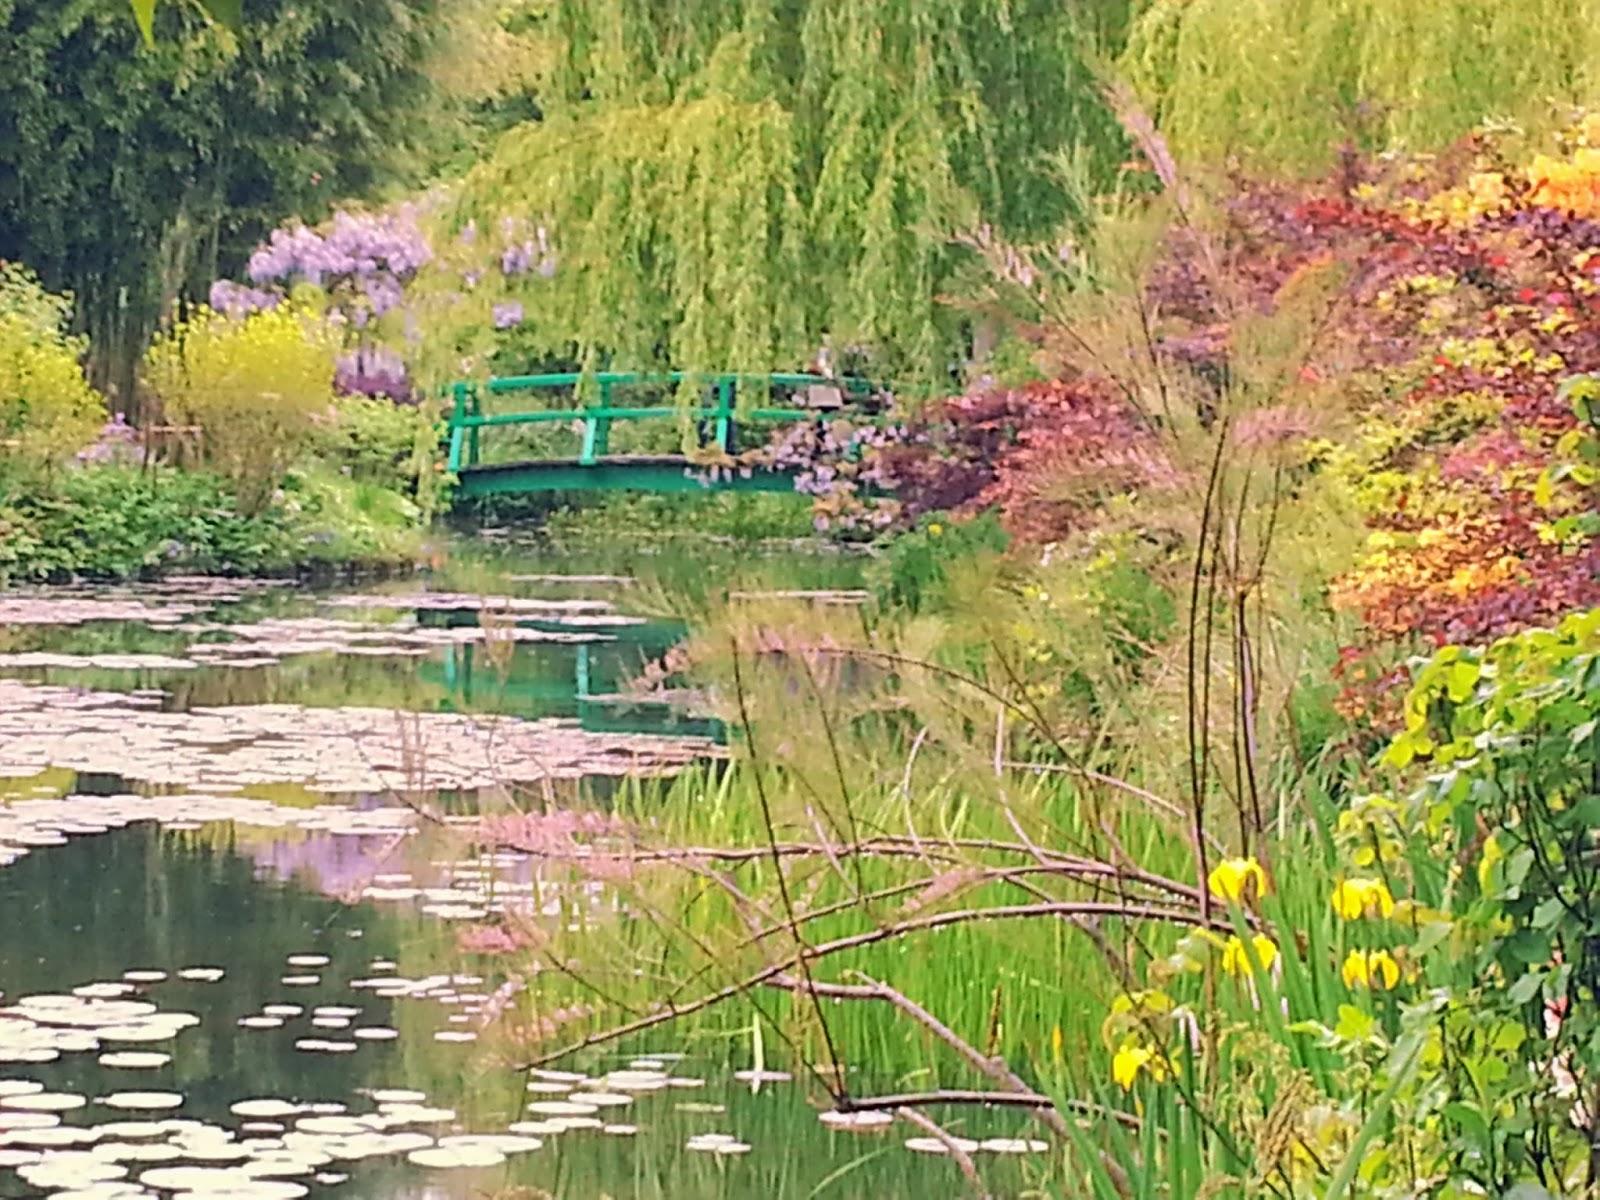 Le jardin de Claude Monet  Giverny